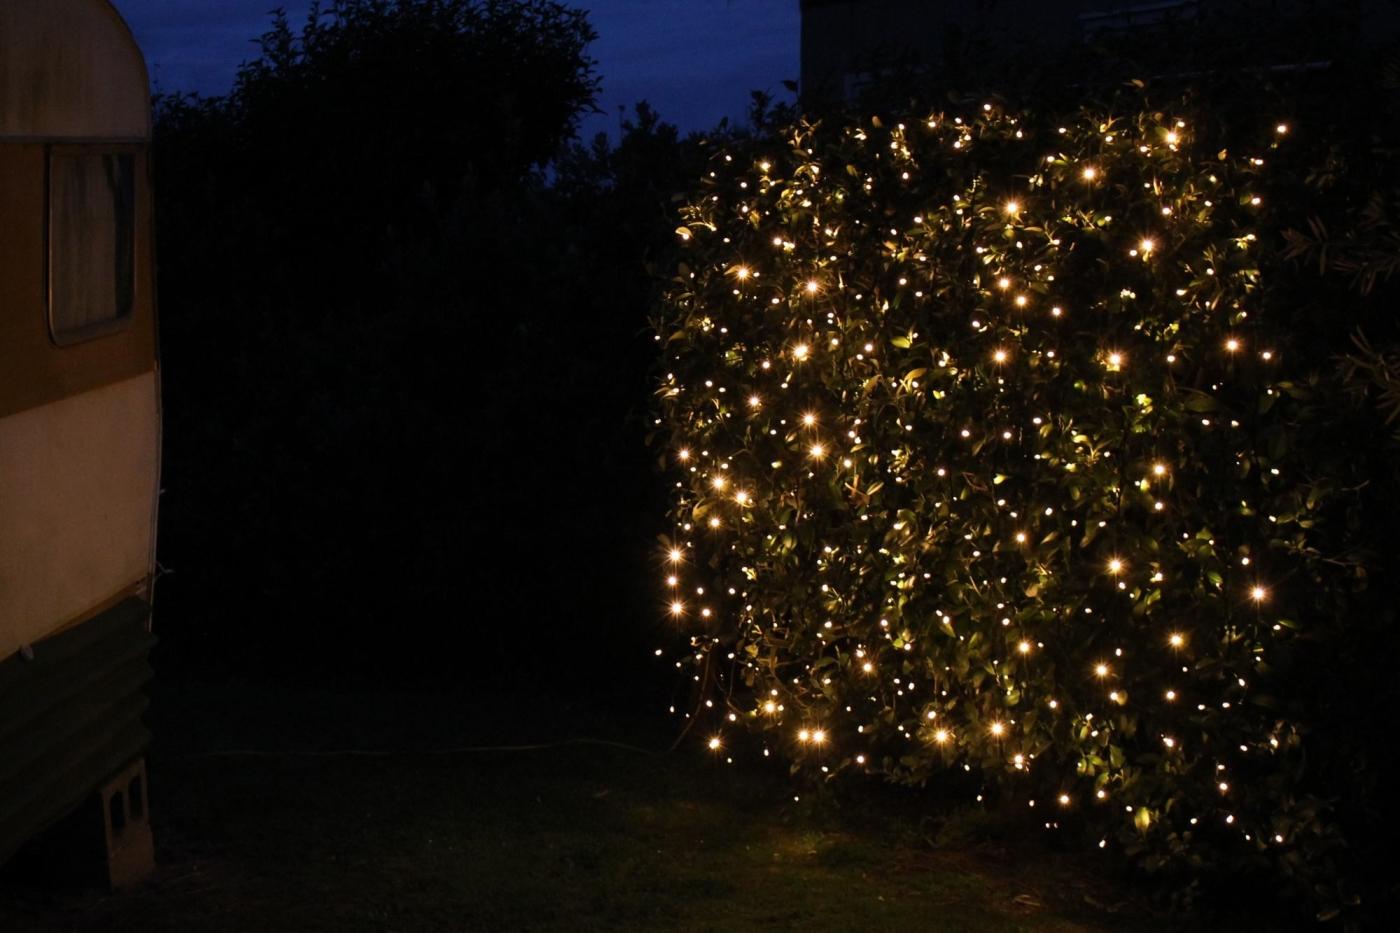 240v Outdoor Lighting Democraciaejustica Electricssingle Way Curtain Fairy Lights 2m X Black Cable